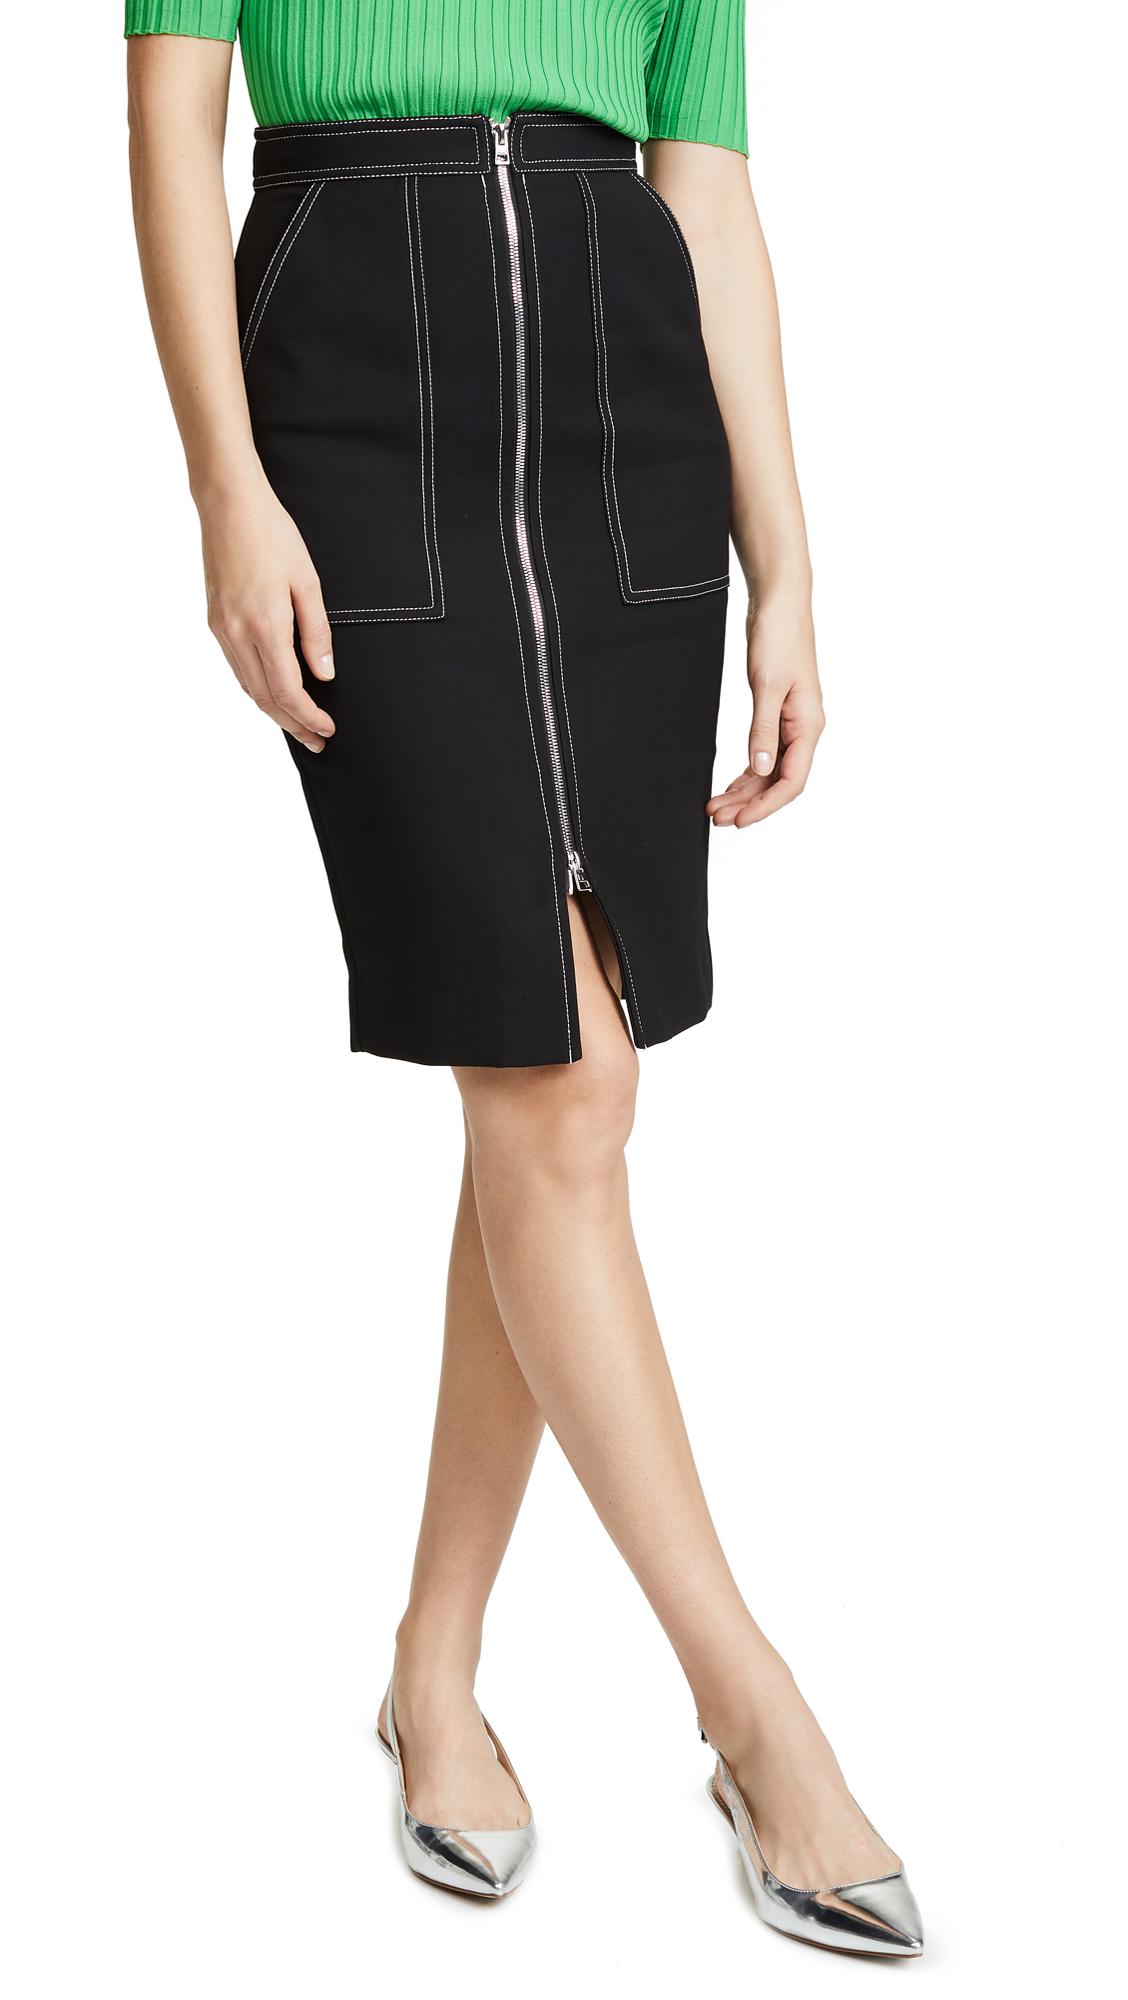 Cotton Patch Pocket Zip Skirt